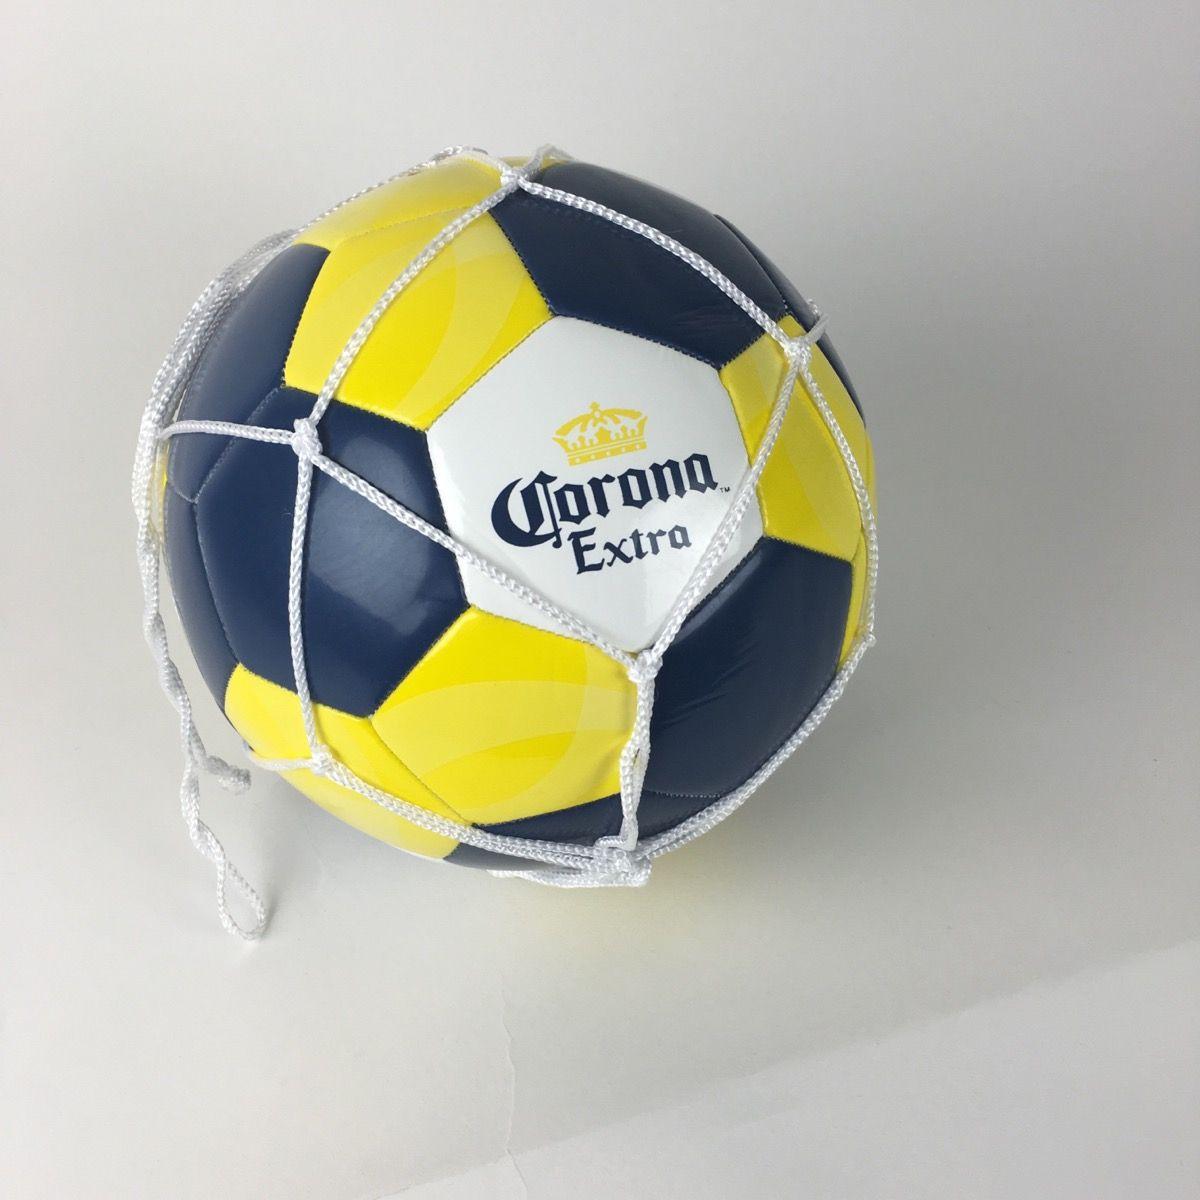 Soccer Ball Vase Of Pin by Photoball On soccer Pinterest with Pin by Photoball On soccer Pinterest